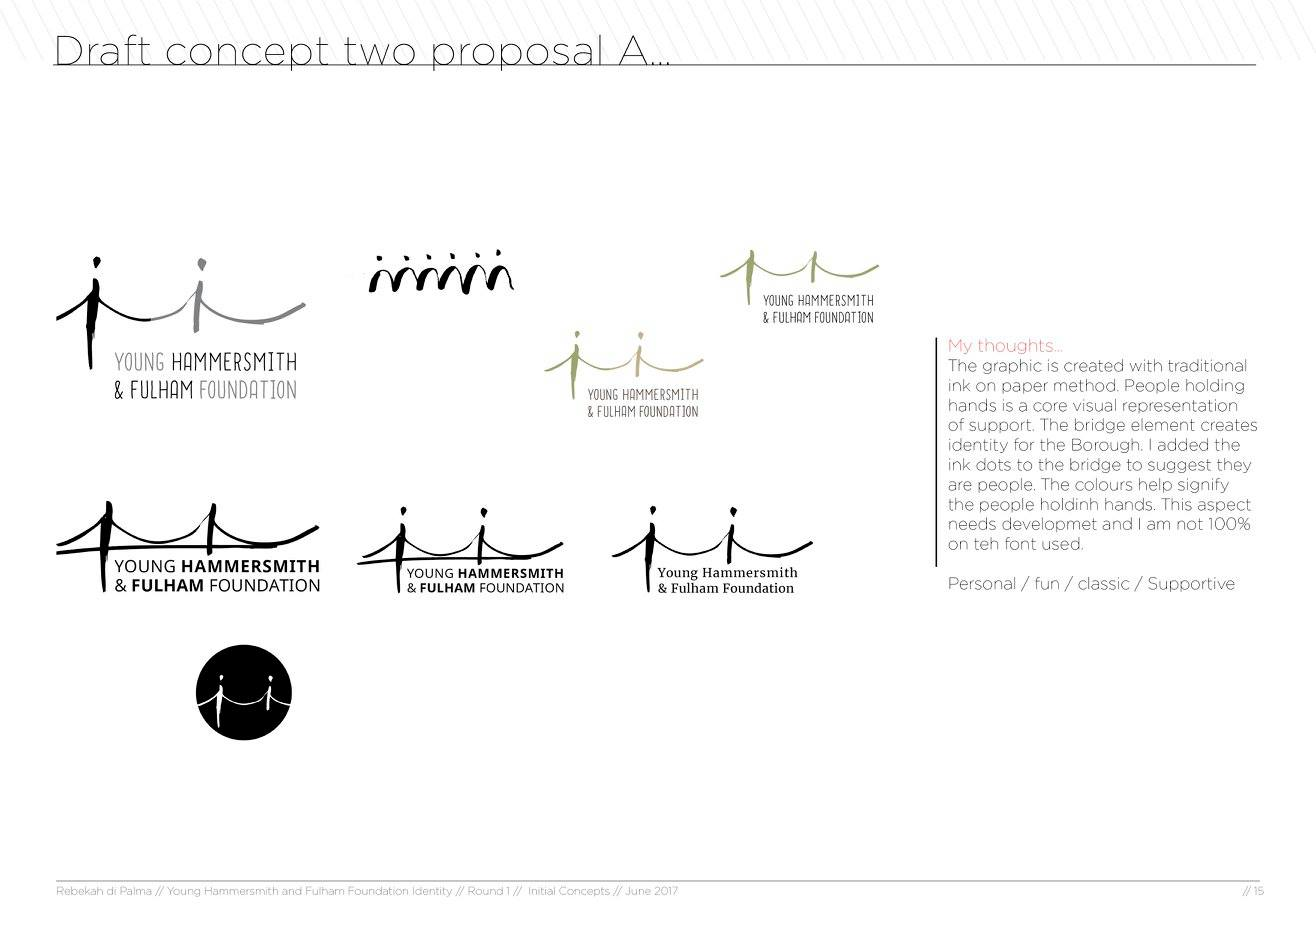 Conceptual round example